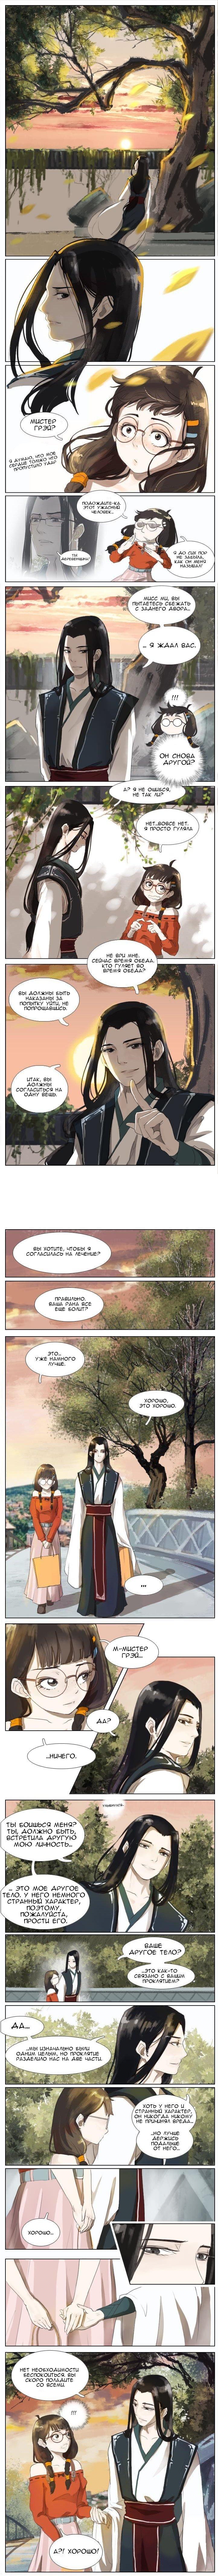 Манга Желание феи - Глава 6 Страница 1